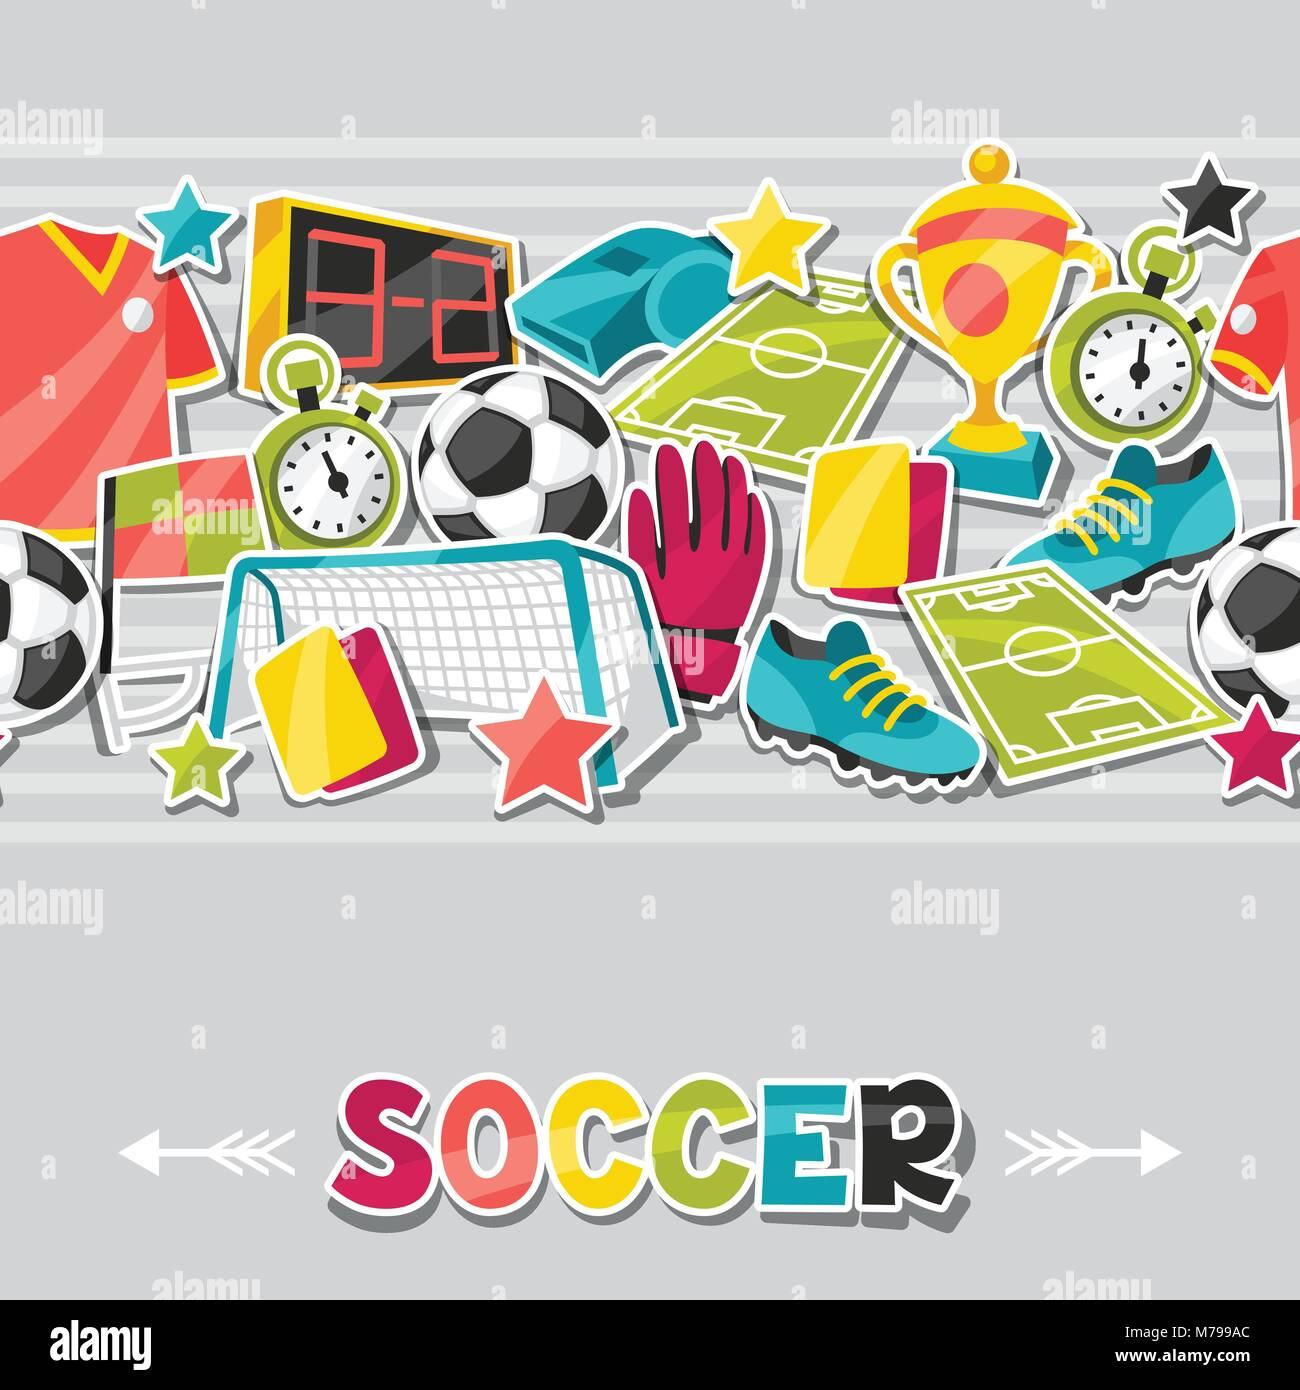 Sports Ball Cartoon Imágenes De Stock   Sports Ball Cartoon Fotos De ... 5ffcc283d3697